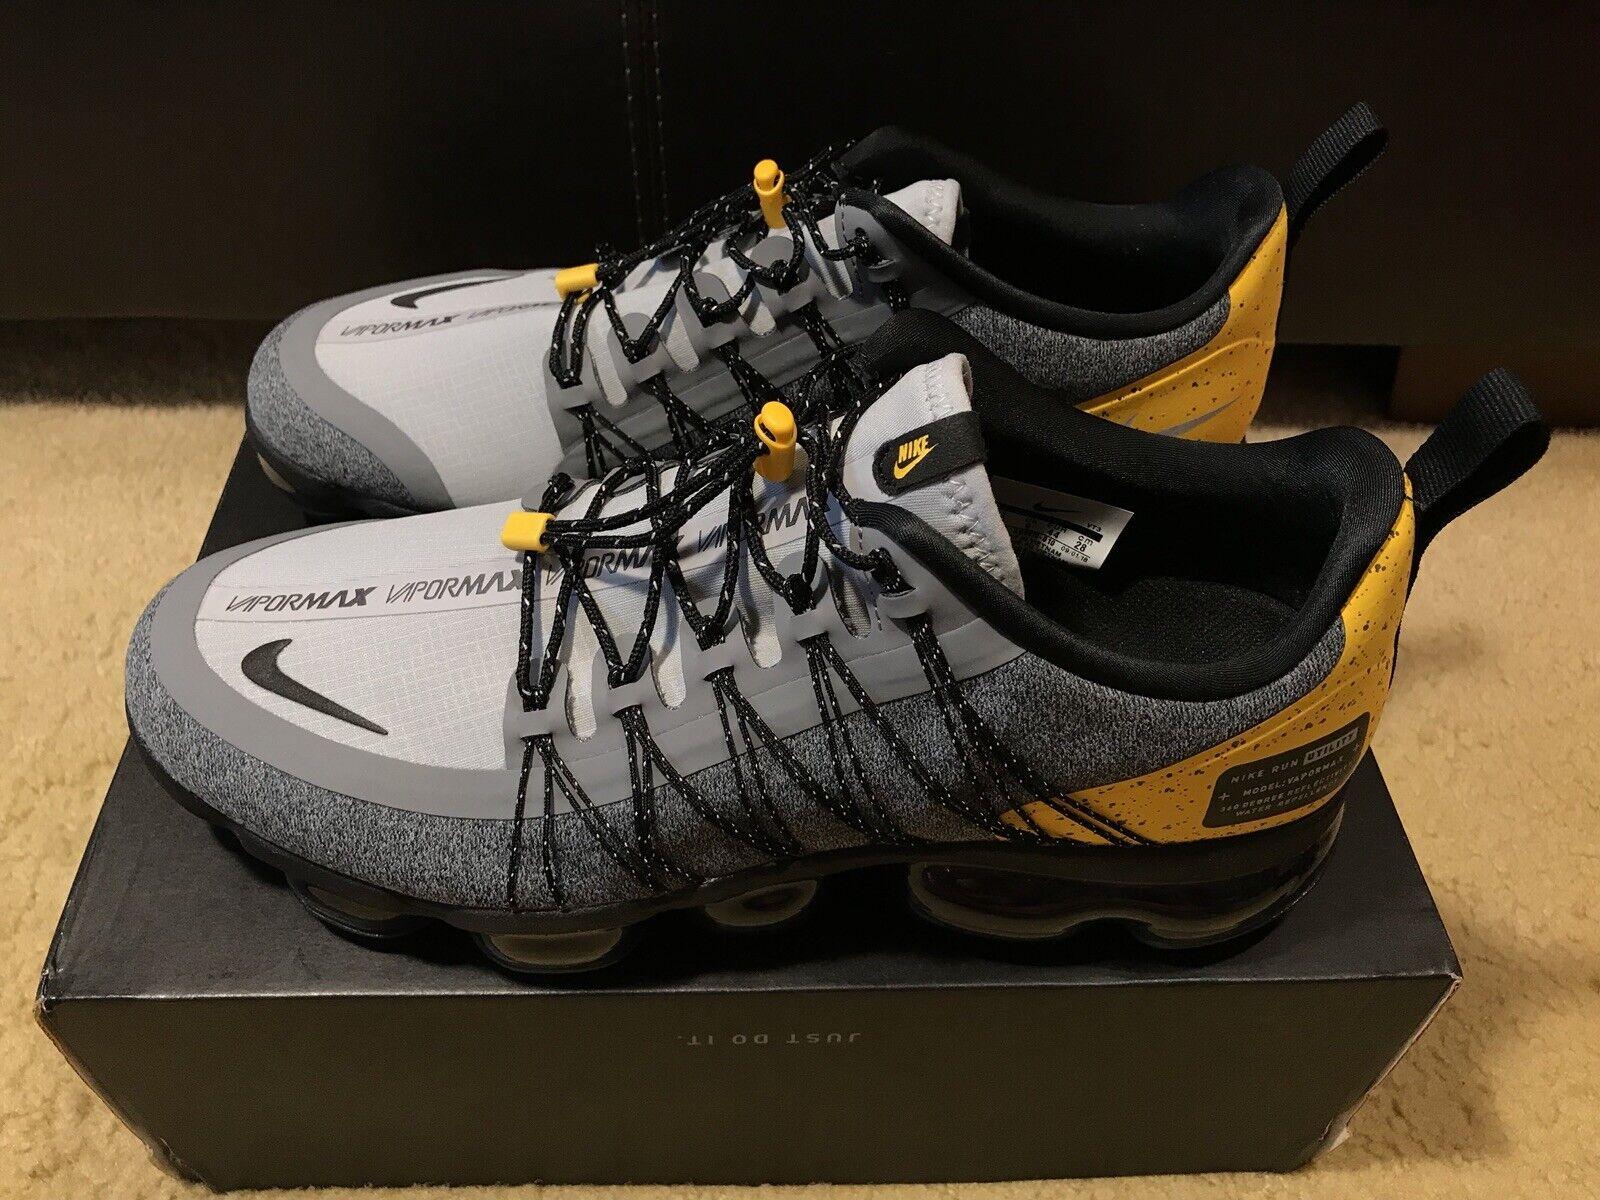 Nike Air Vapormax Run Utility Men's sz 10 Wolf Grey Black yellow AQ8810 010